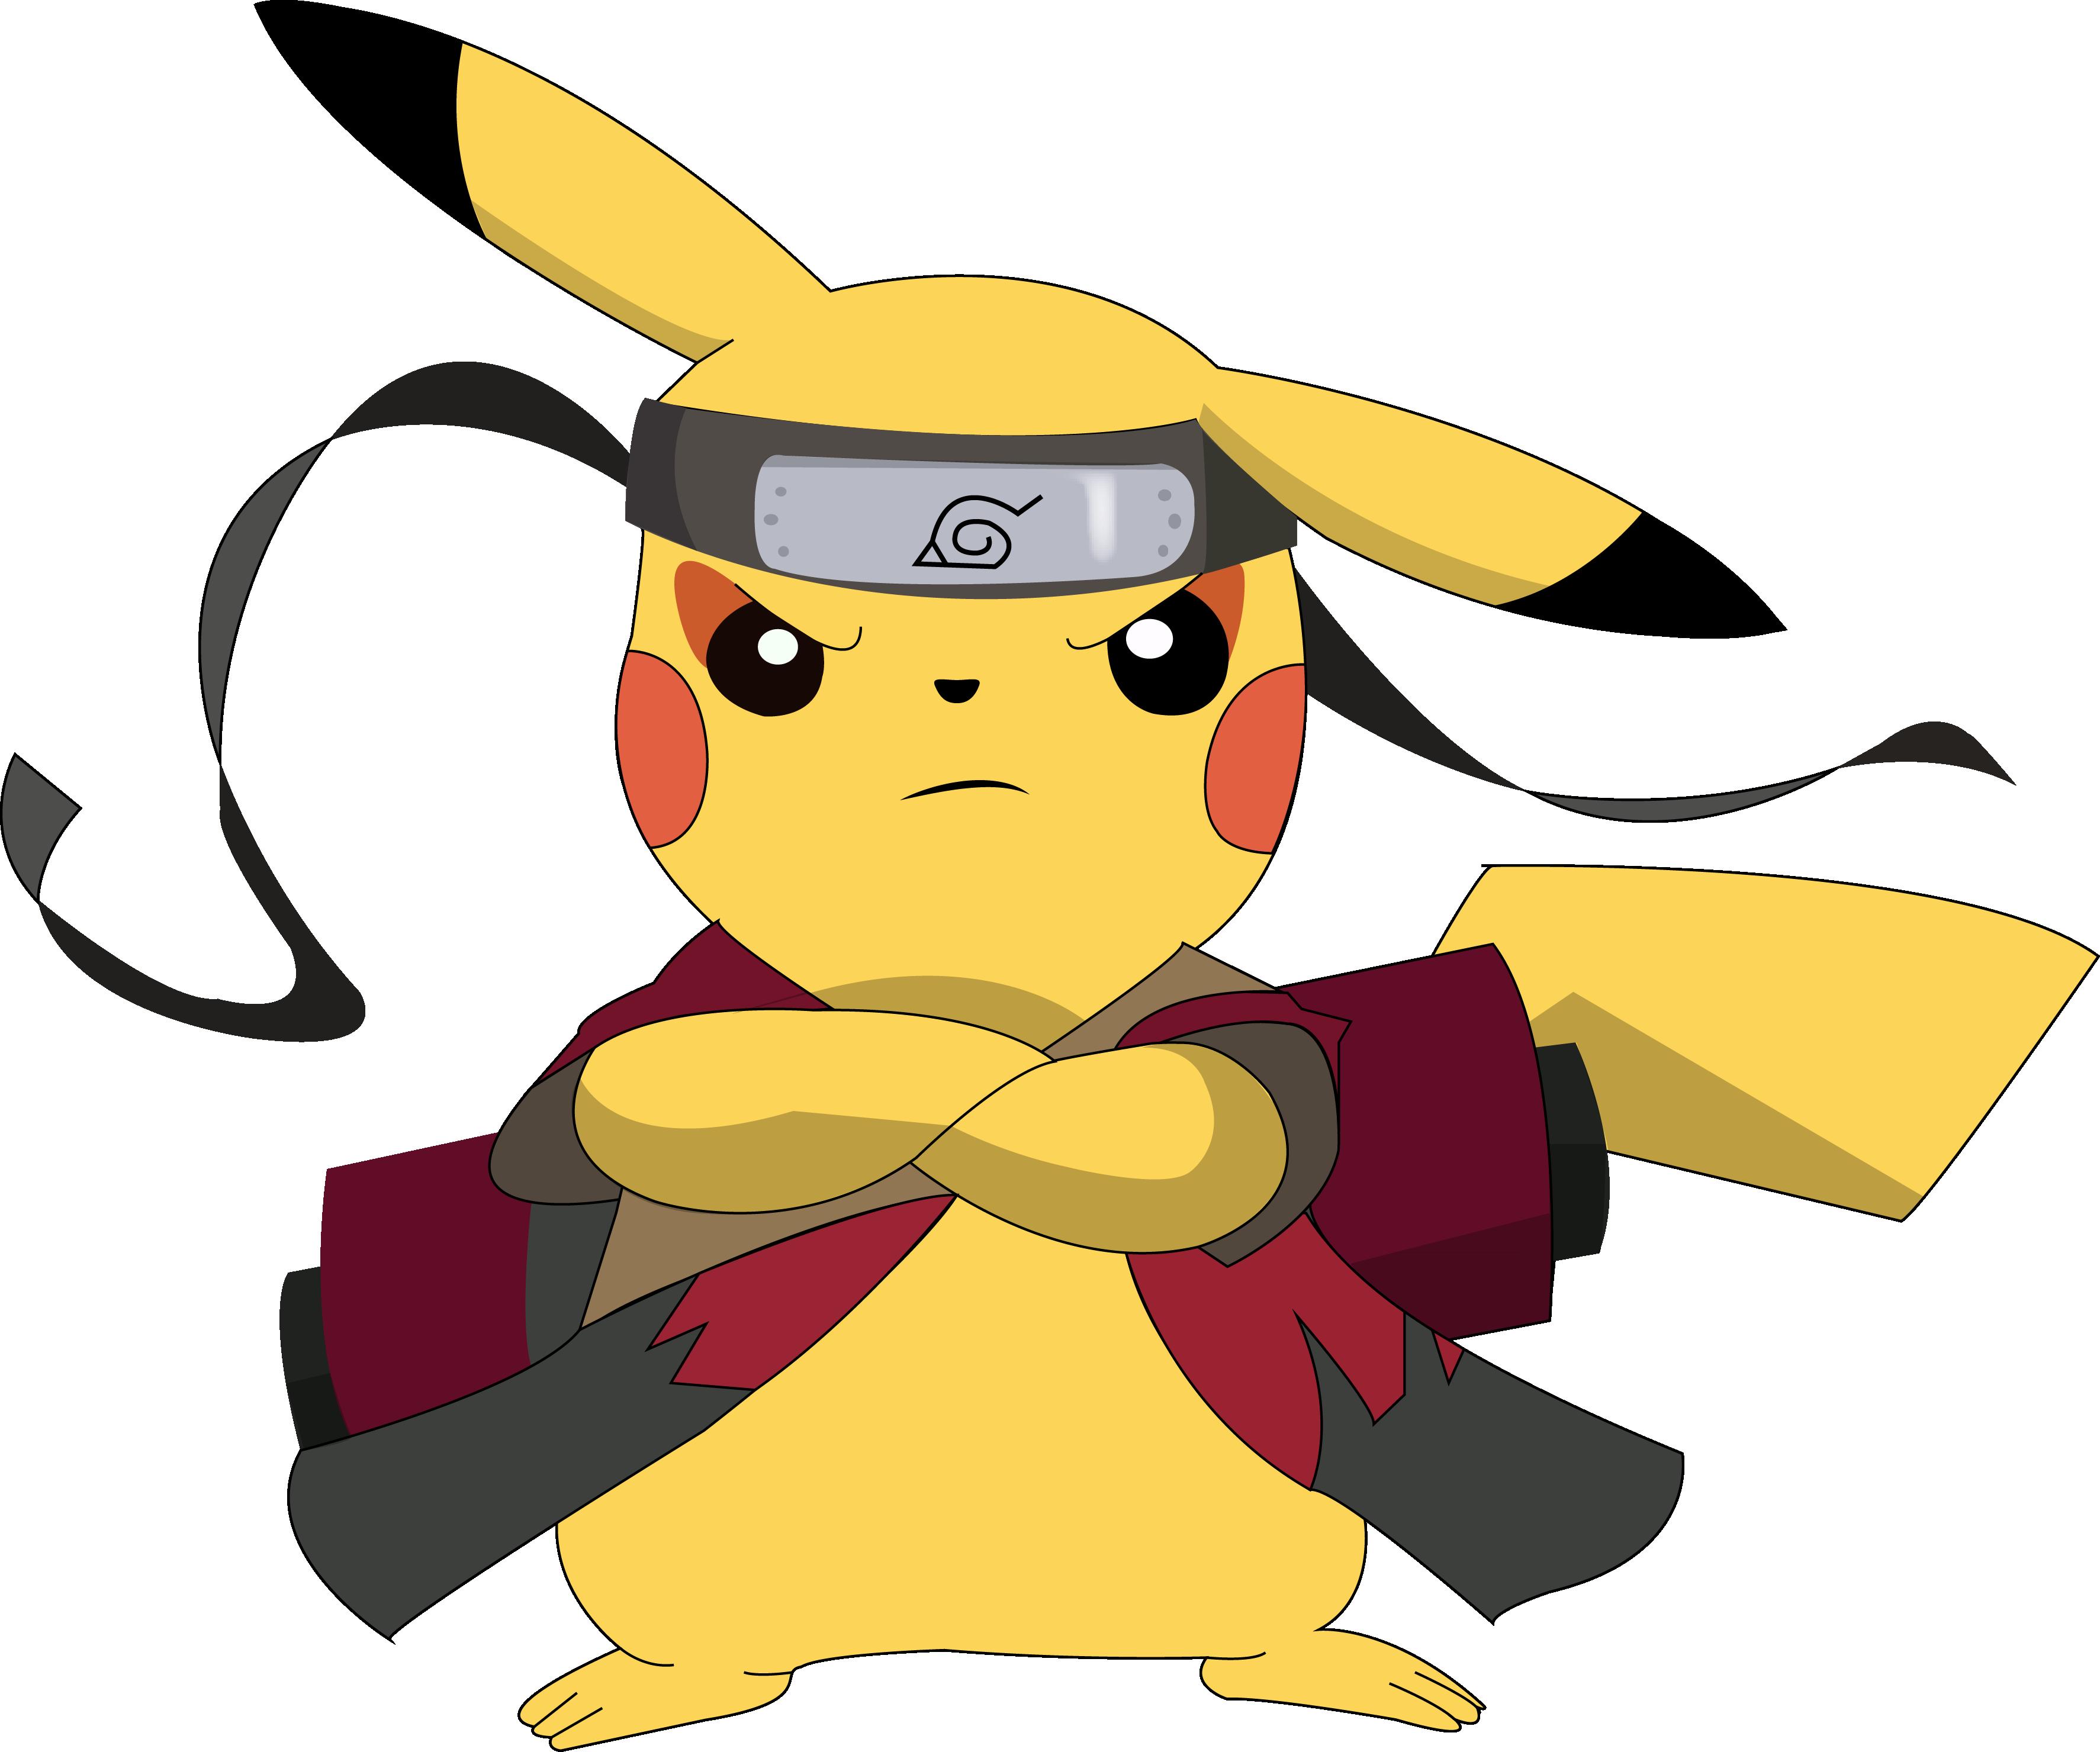 Pikachu sennin by edumander on deviantart dope pikachu naruto naruto merchandise - Dessin de pikachu ...